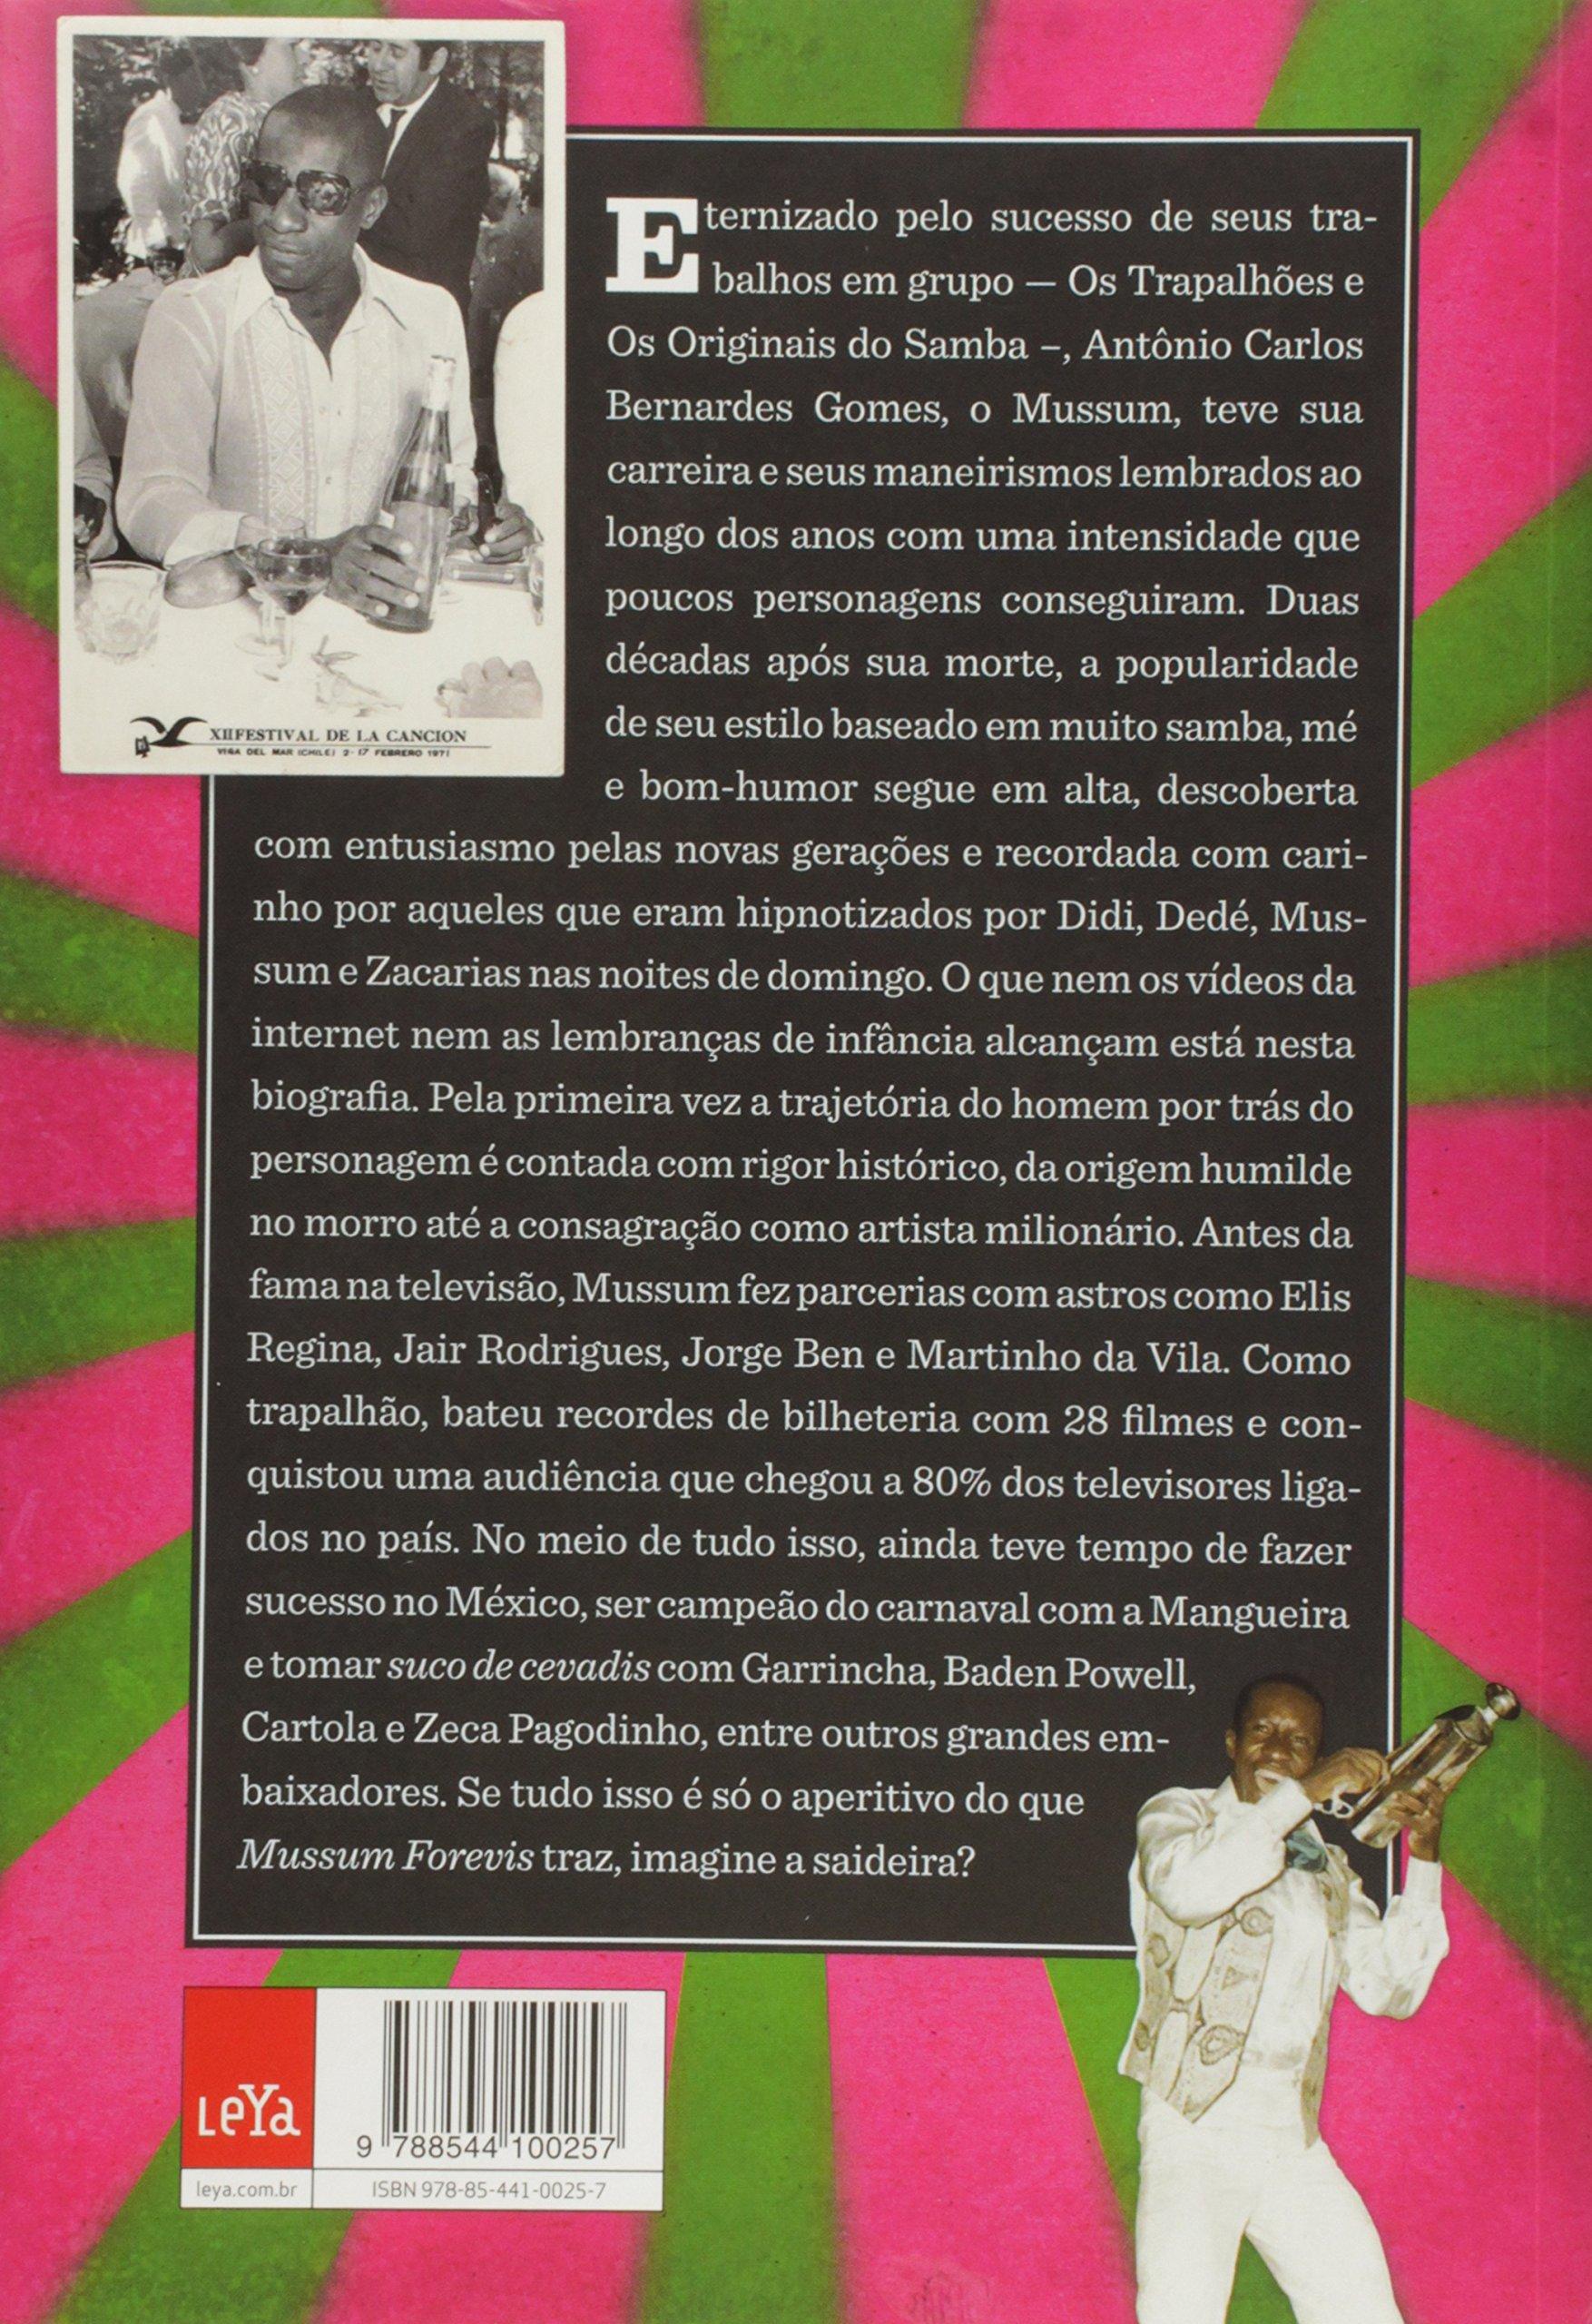 Mussum Forévis (Em Portuguese do Brasil): Amazon.es: Juliano Barreto: Libros